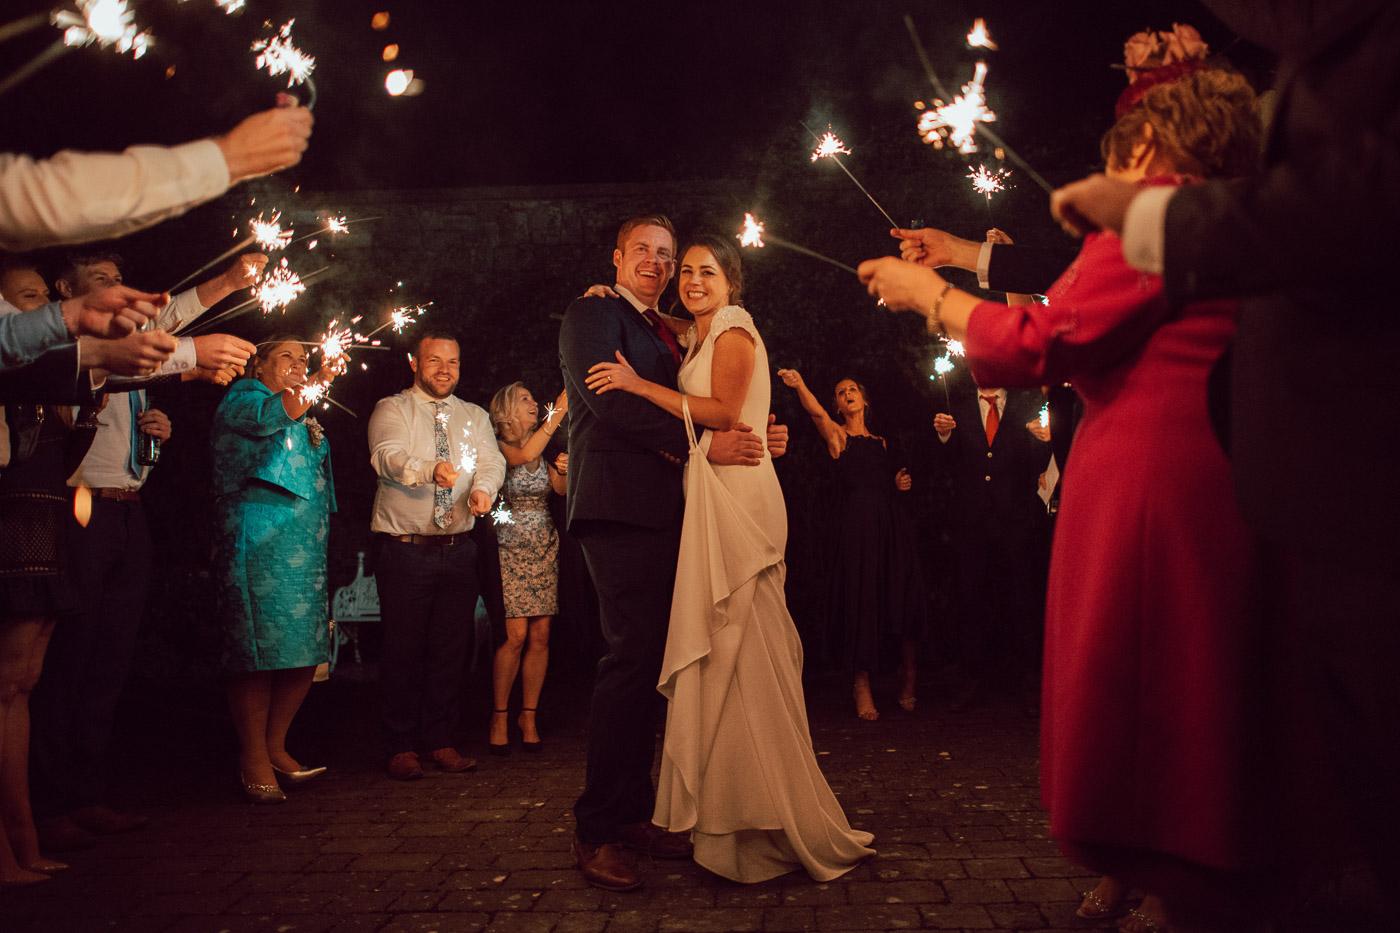 Wedding At Night Celebration